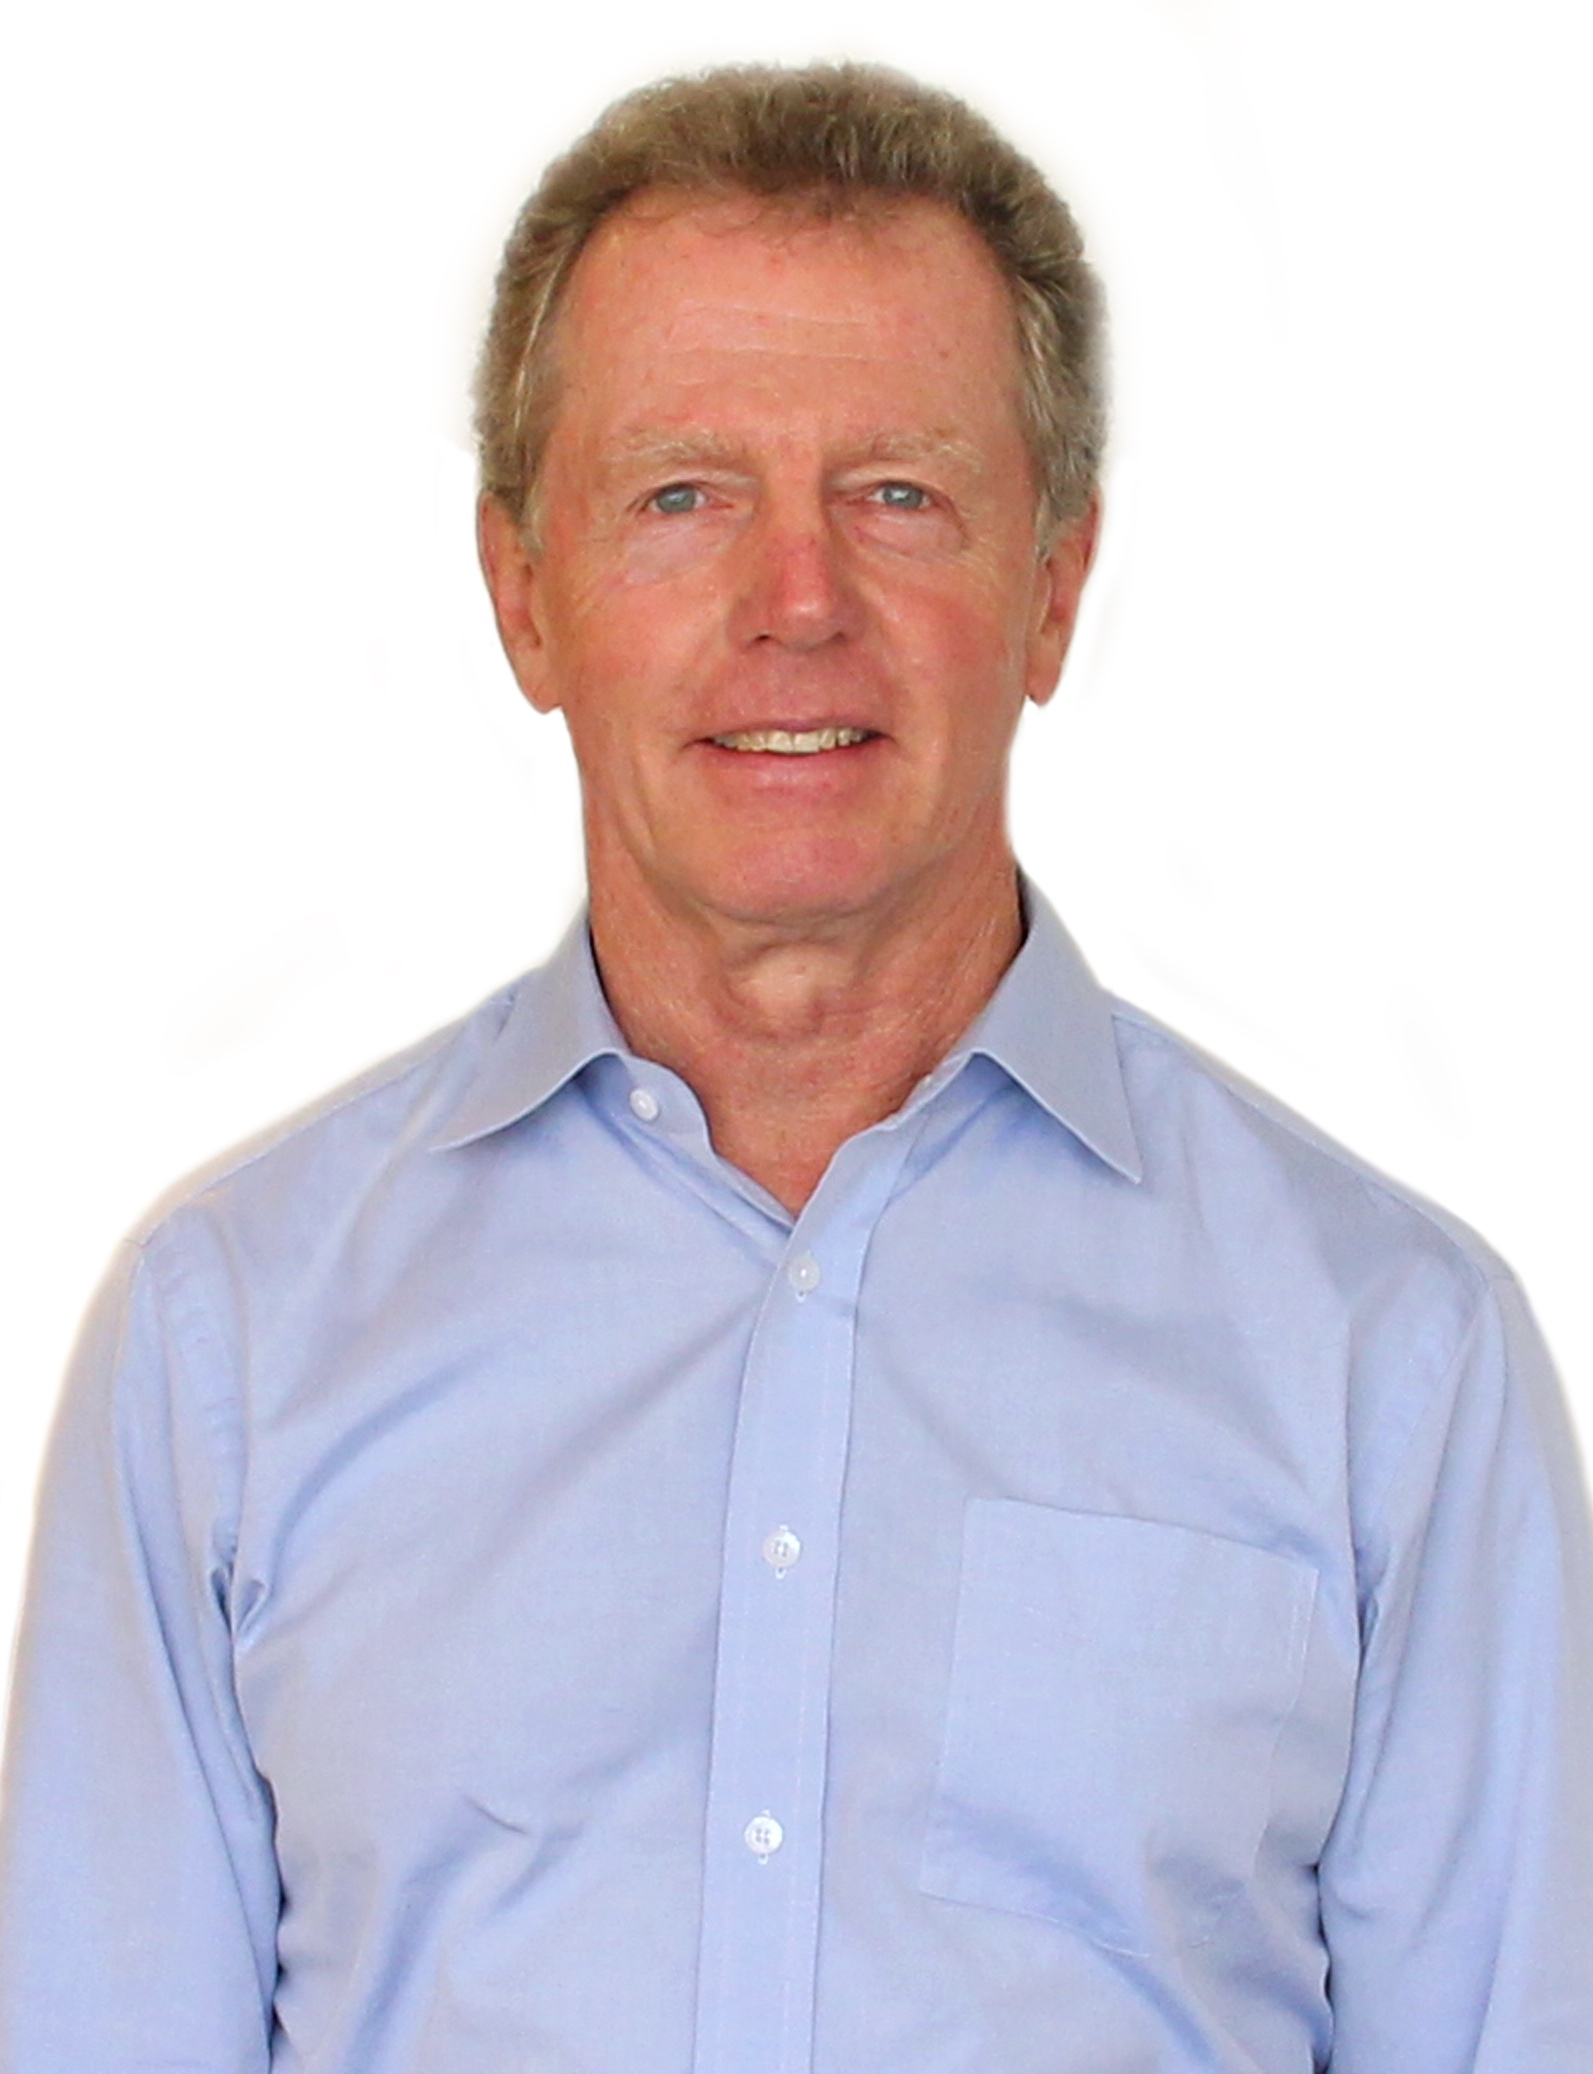 Glenn Barrett, Chairman and CEO, OrthoLite